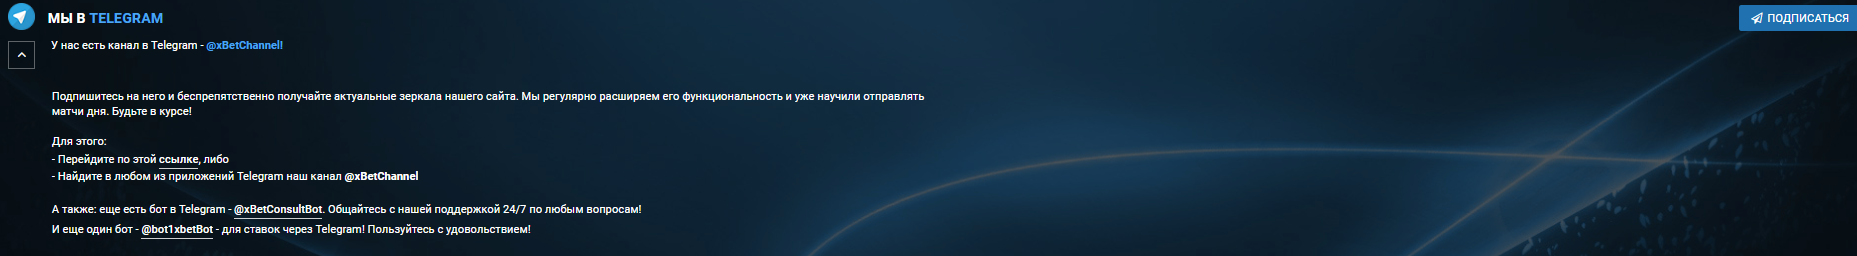 1хБет - бот в Телеграме